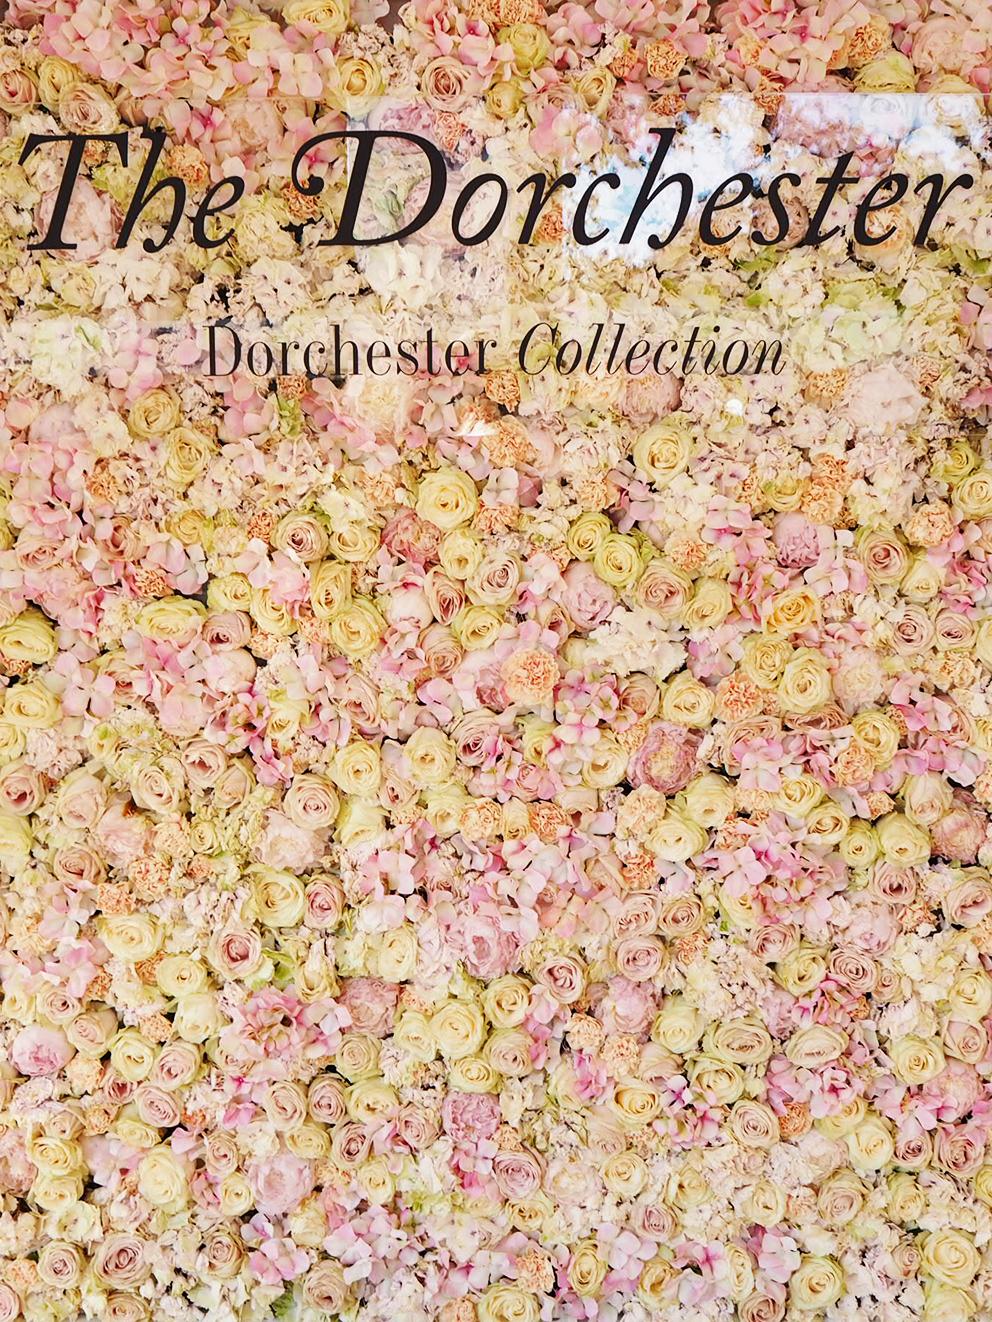 French For Pineapple Blog - RHS Chelsea Flower Show 2017 - Dorchester Pop-Up Bar Flower Wall